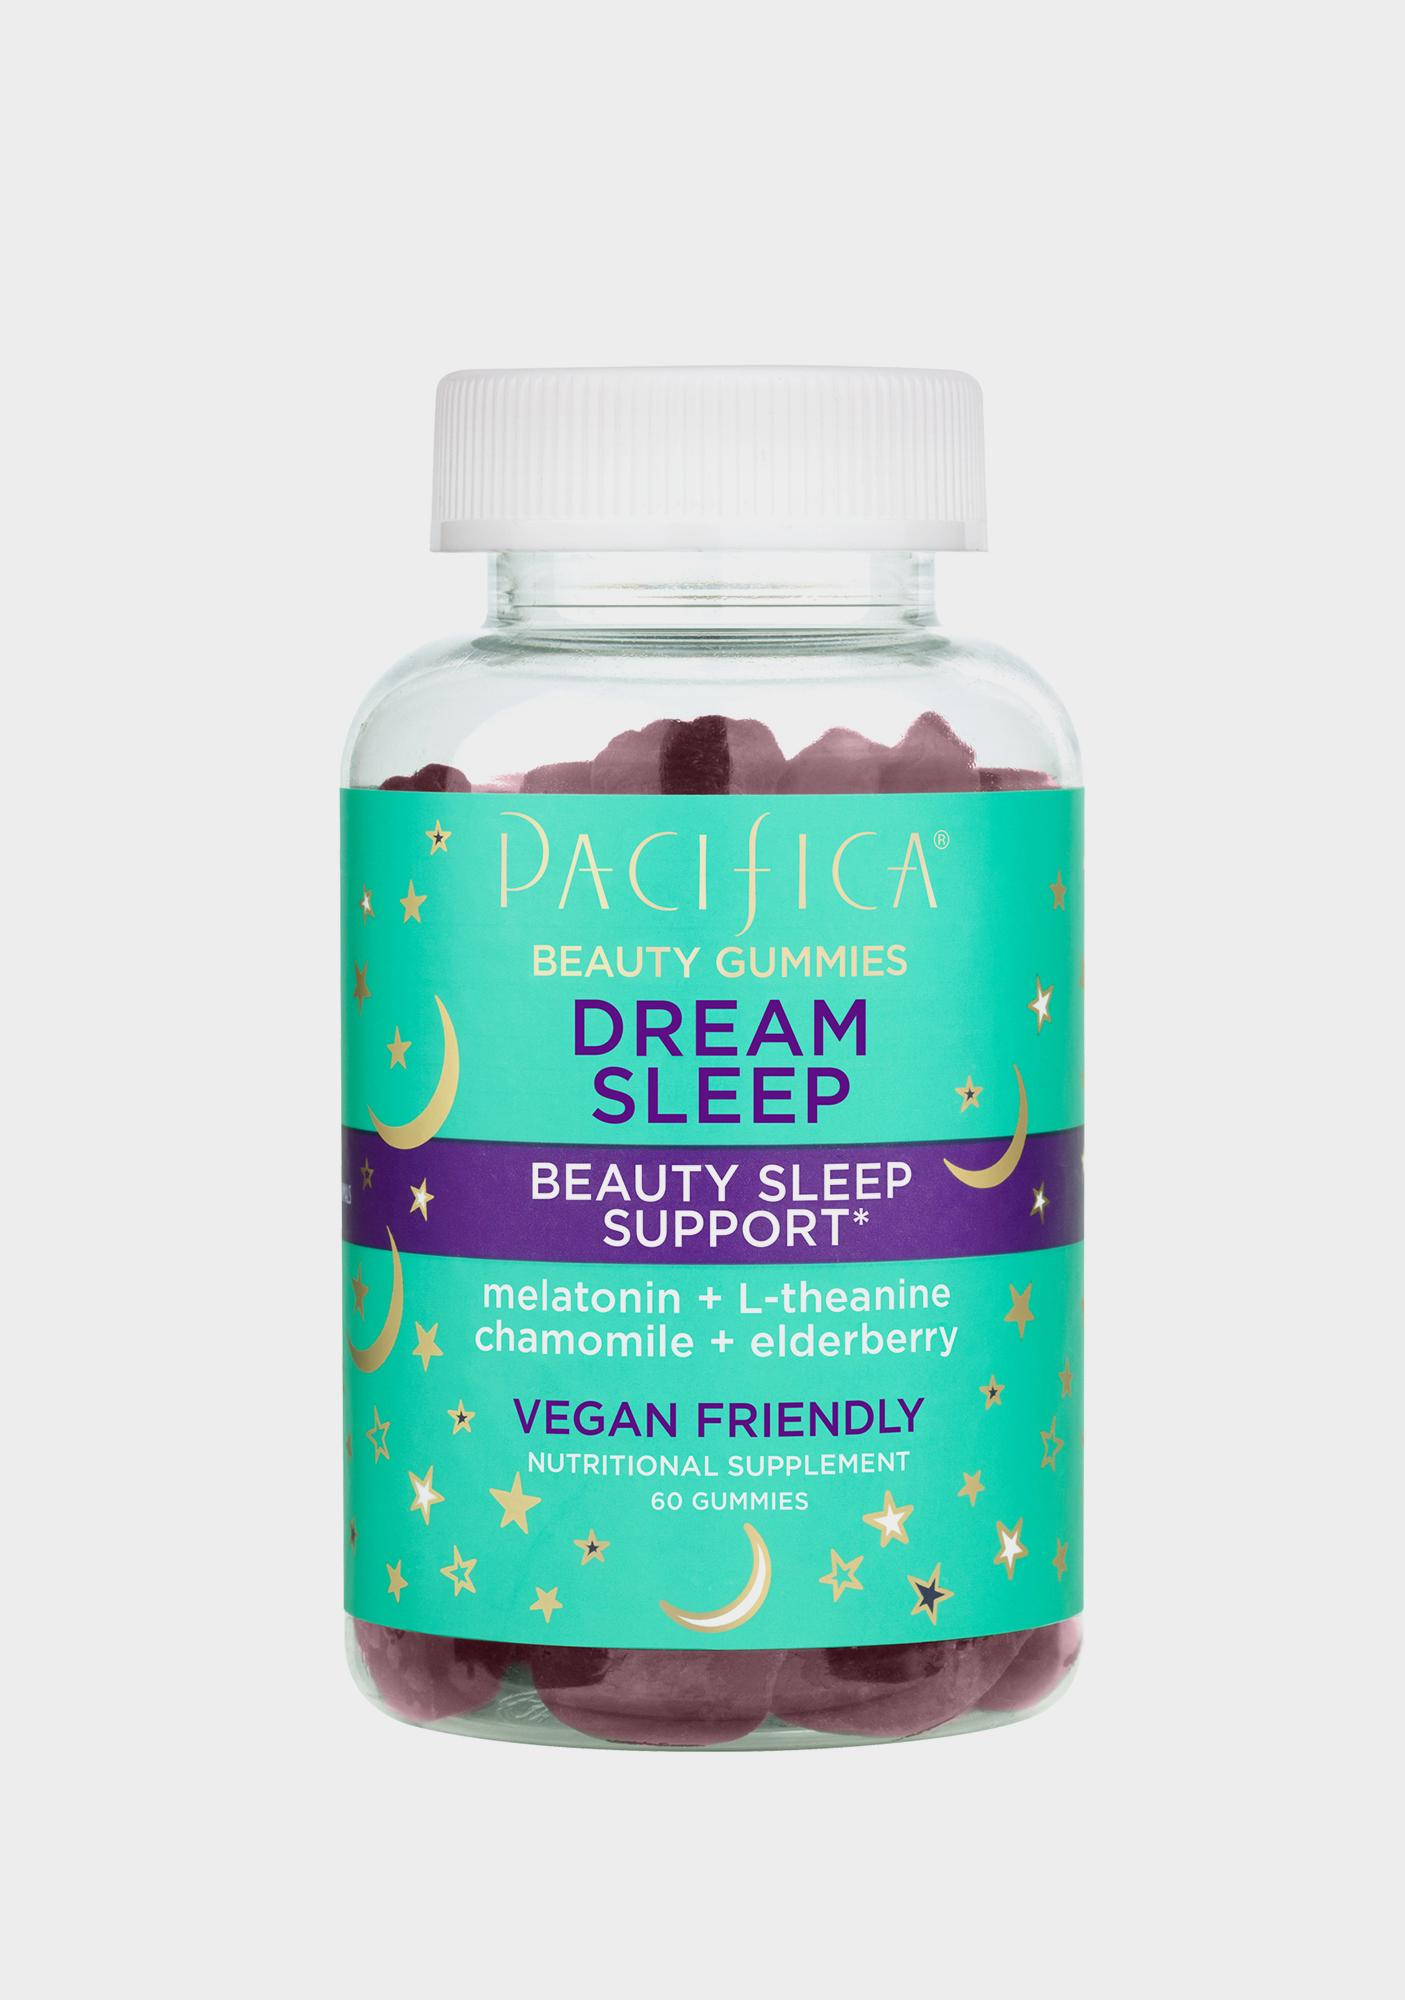 Pacifica Dream Sleep Beauty Gummies